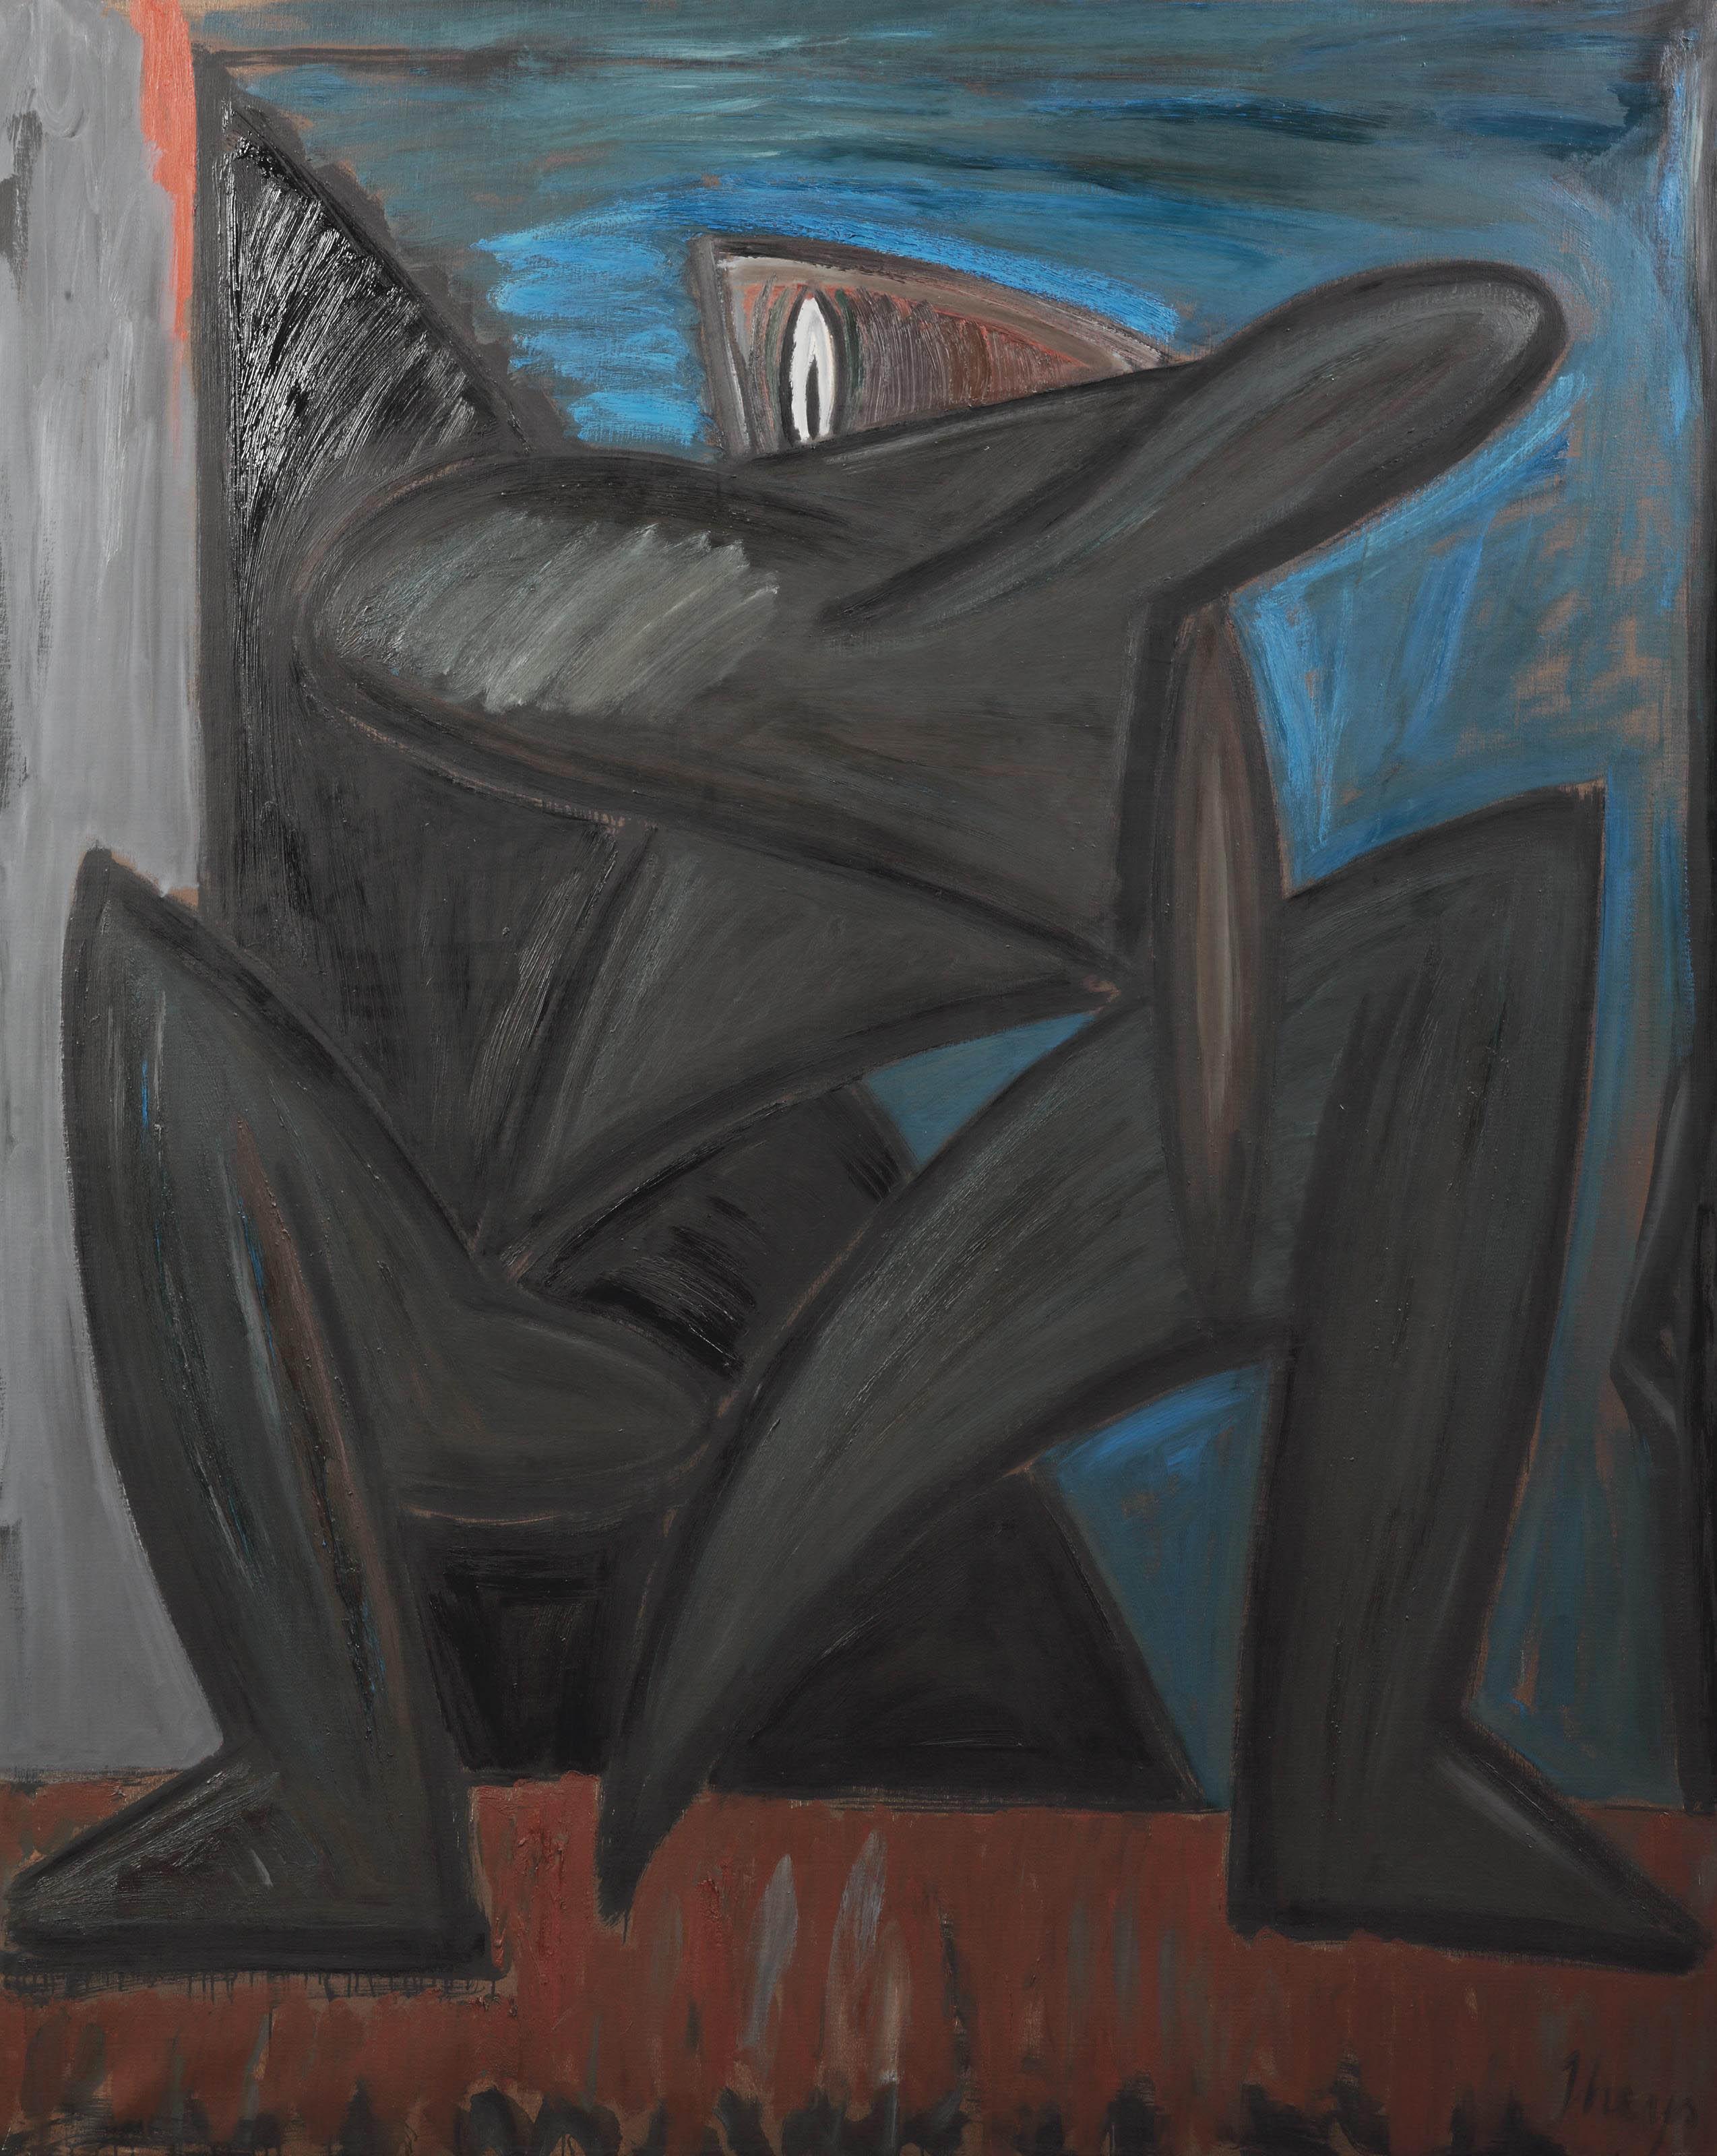 Yvan Theys (1936-2005)